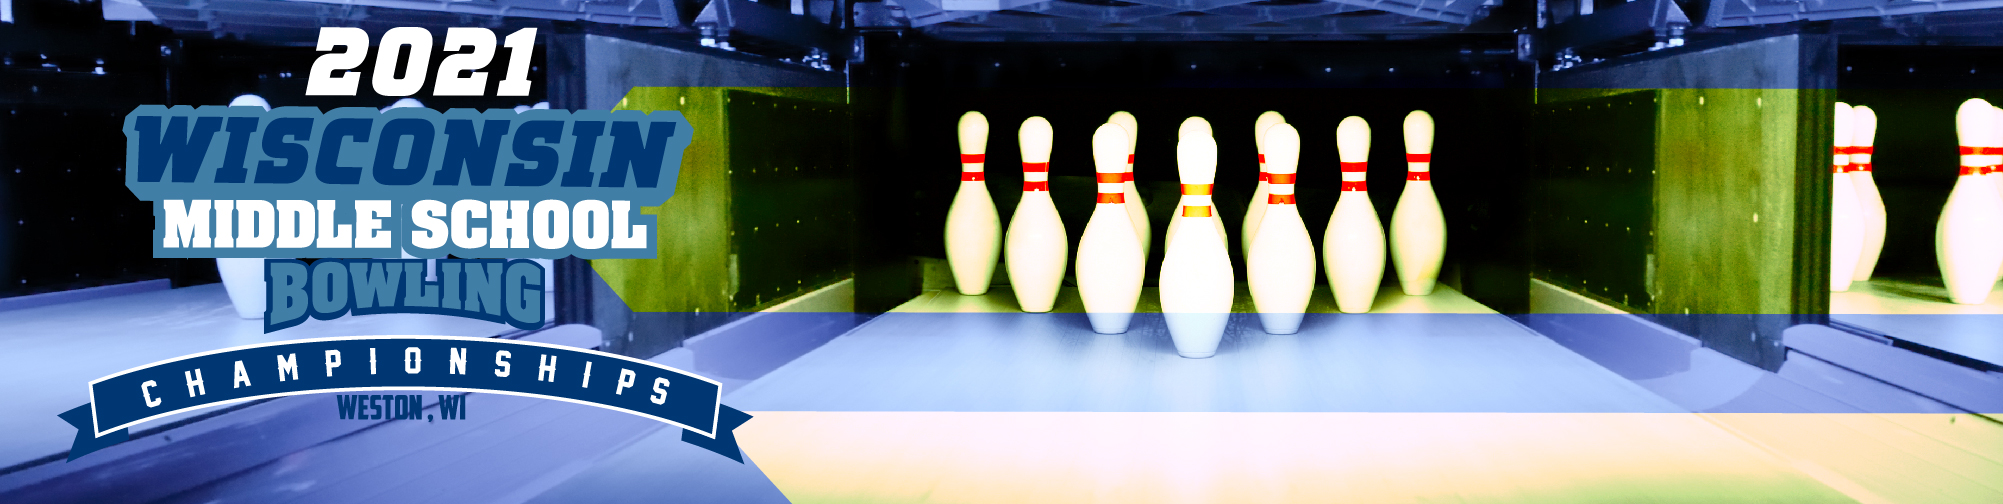 WI School Bowling Championships